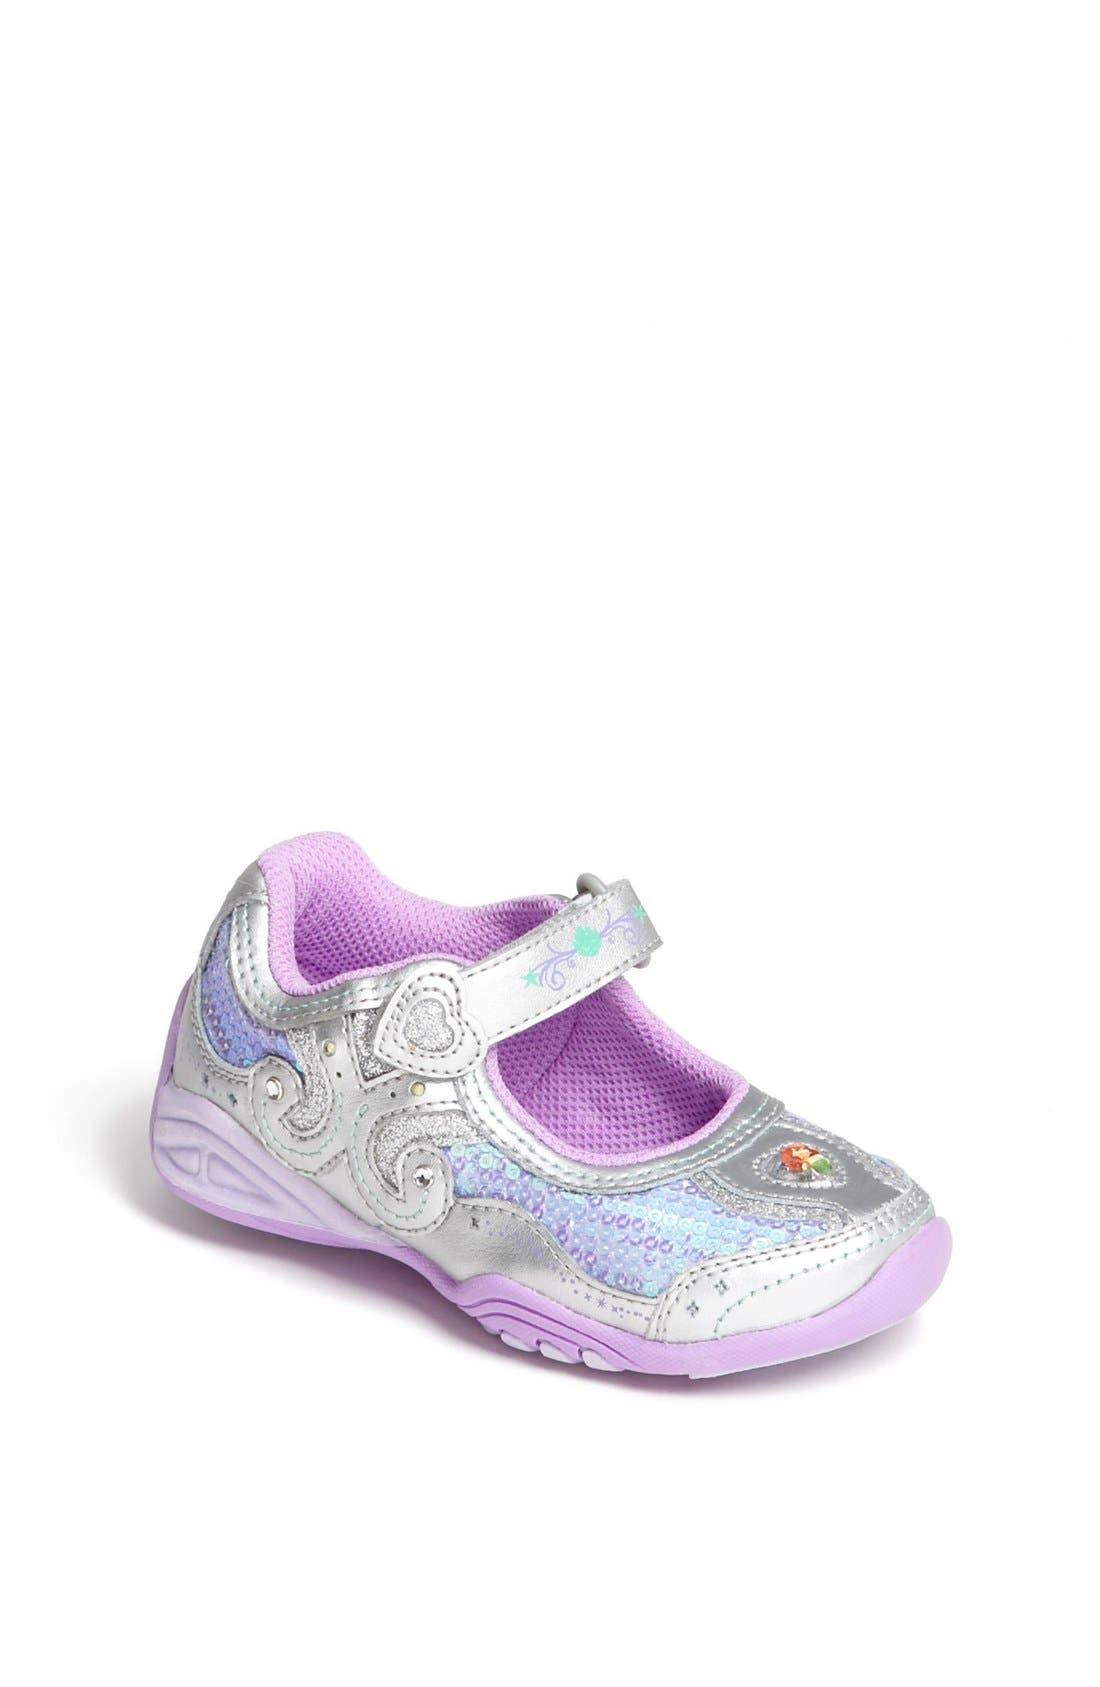 Main Image - Stride Rite 'Disney Wish Lights  - Ariel'  Sneaker (Toddler & Little Kid)